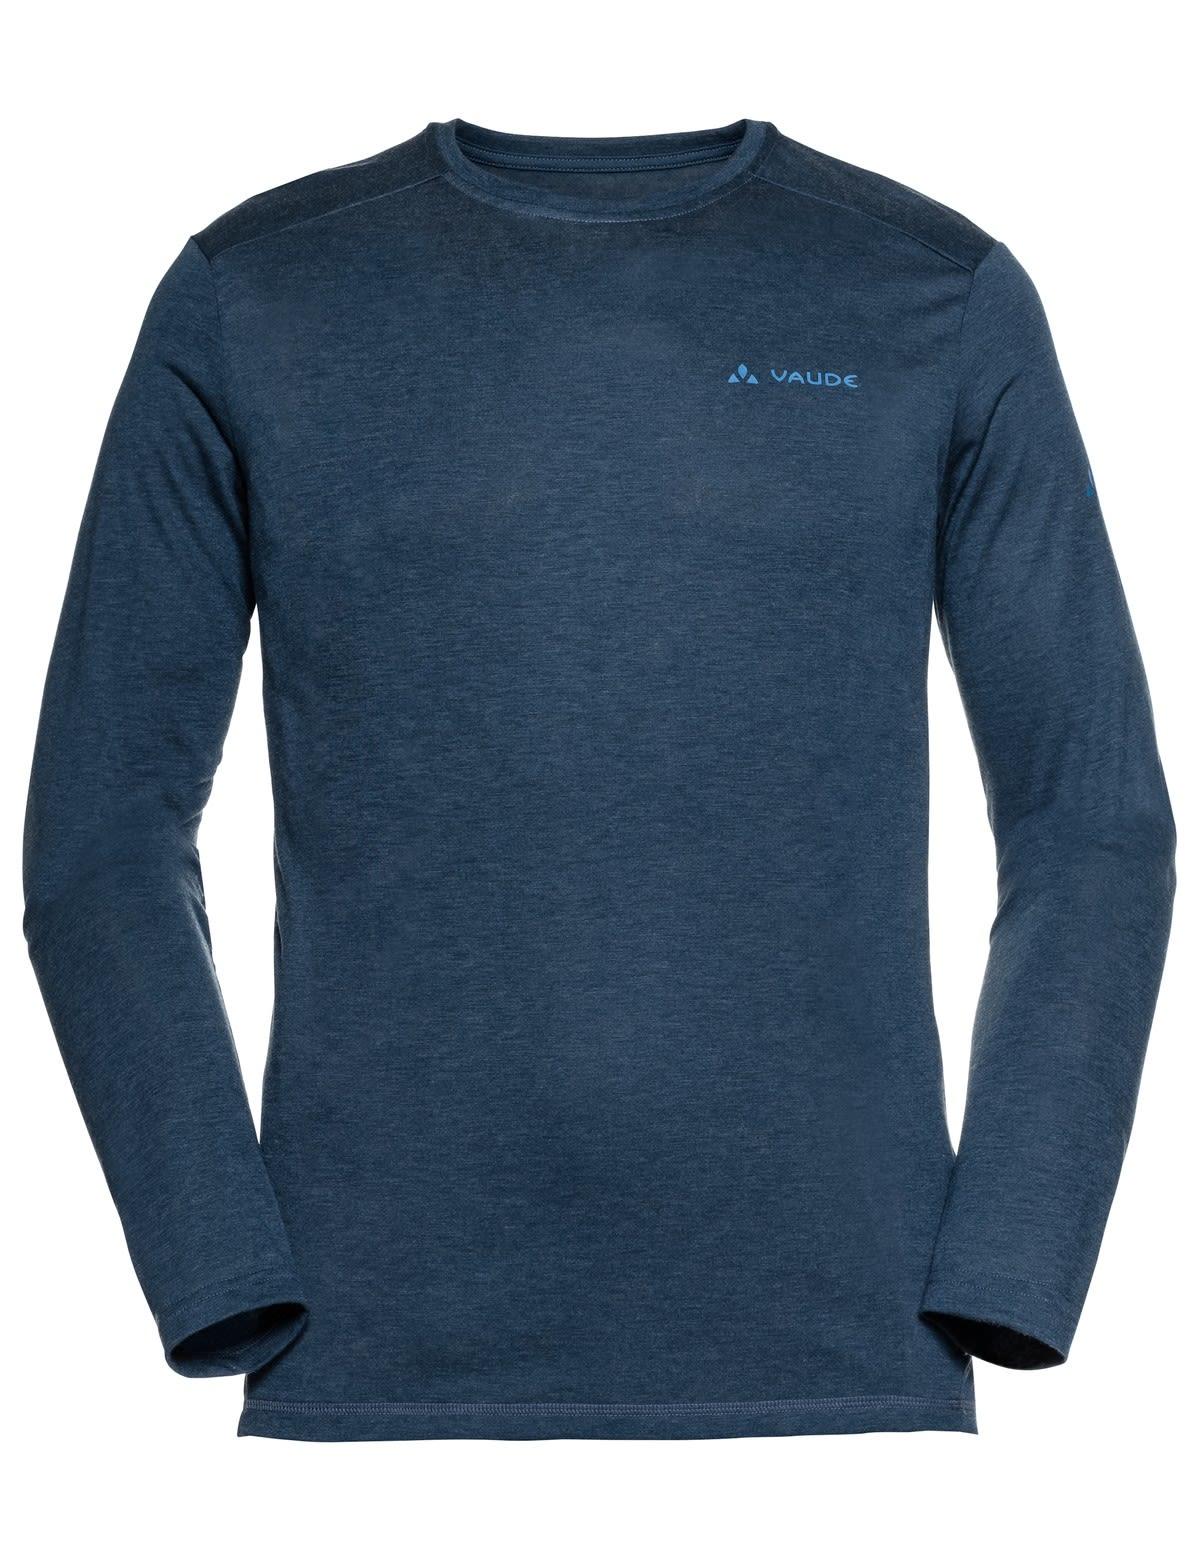 Vaude Mens Sveit Long-Sleeve T-Shirt | Herren Langarm-Shirt